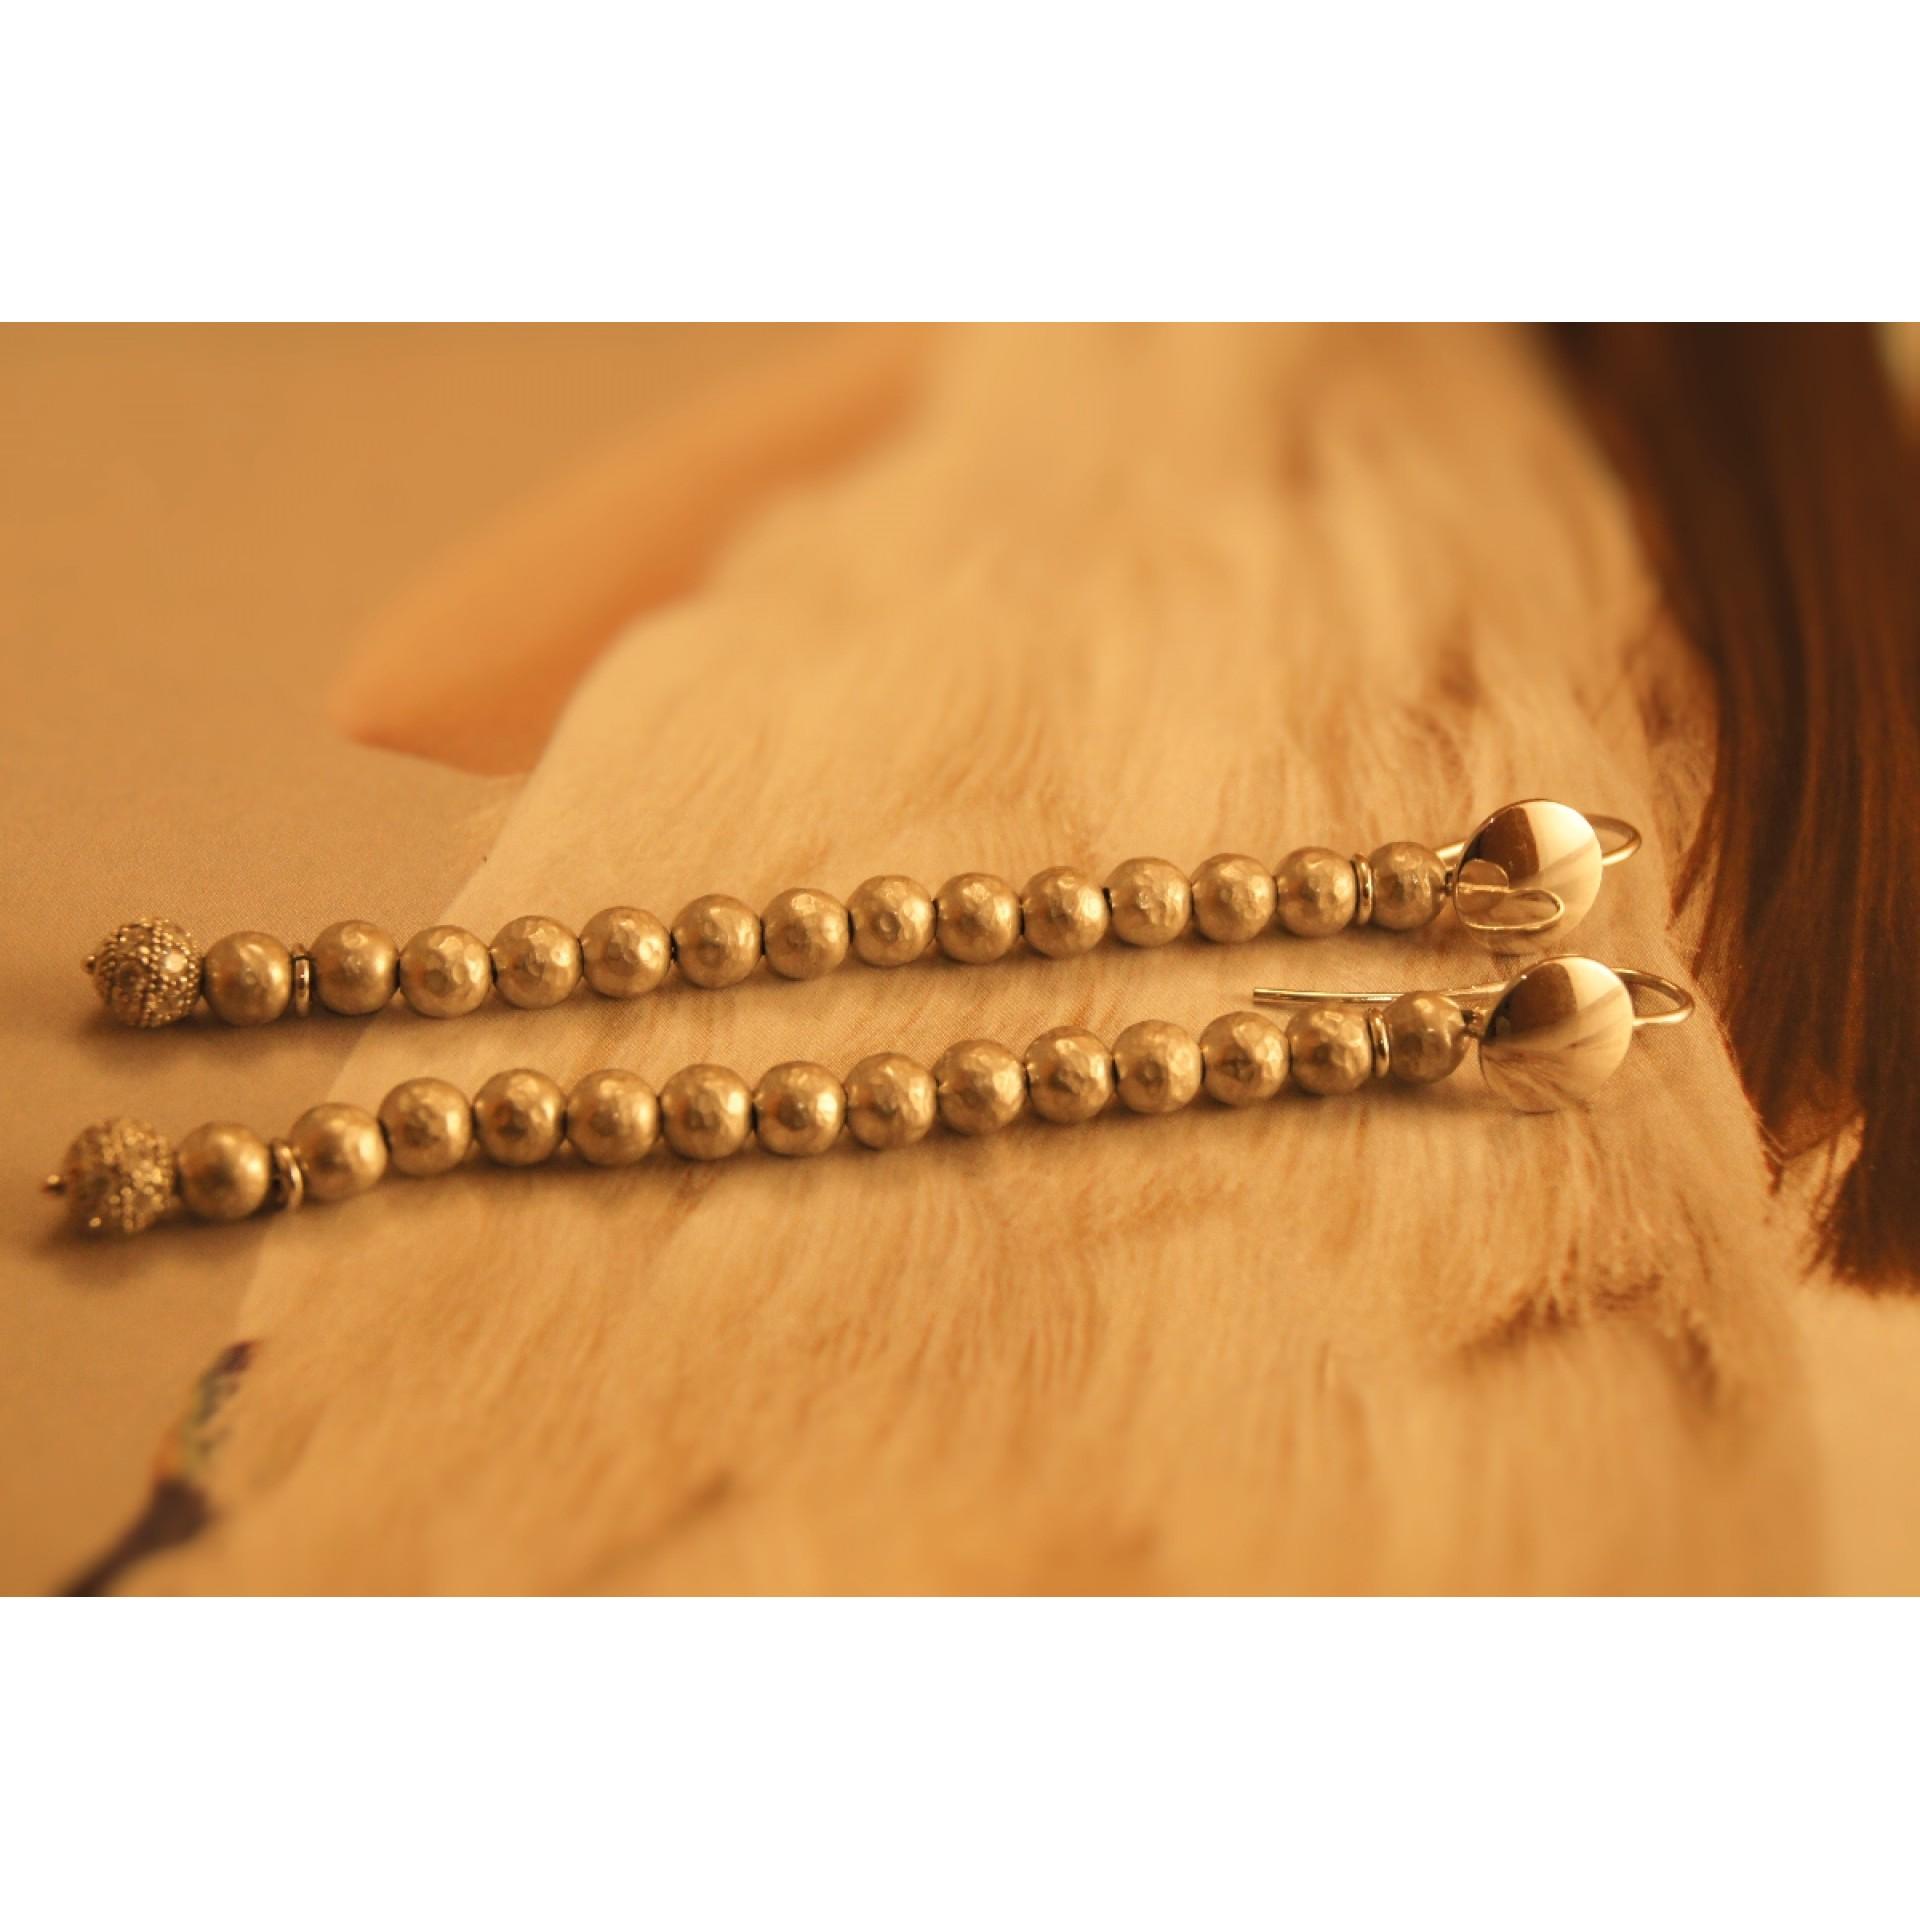 The Balls in Satin silver earrings